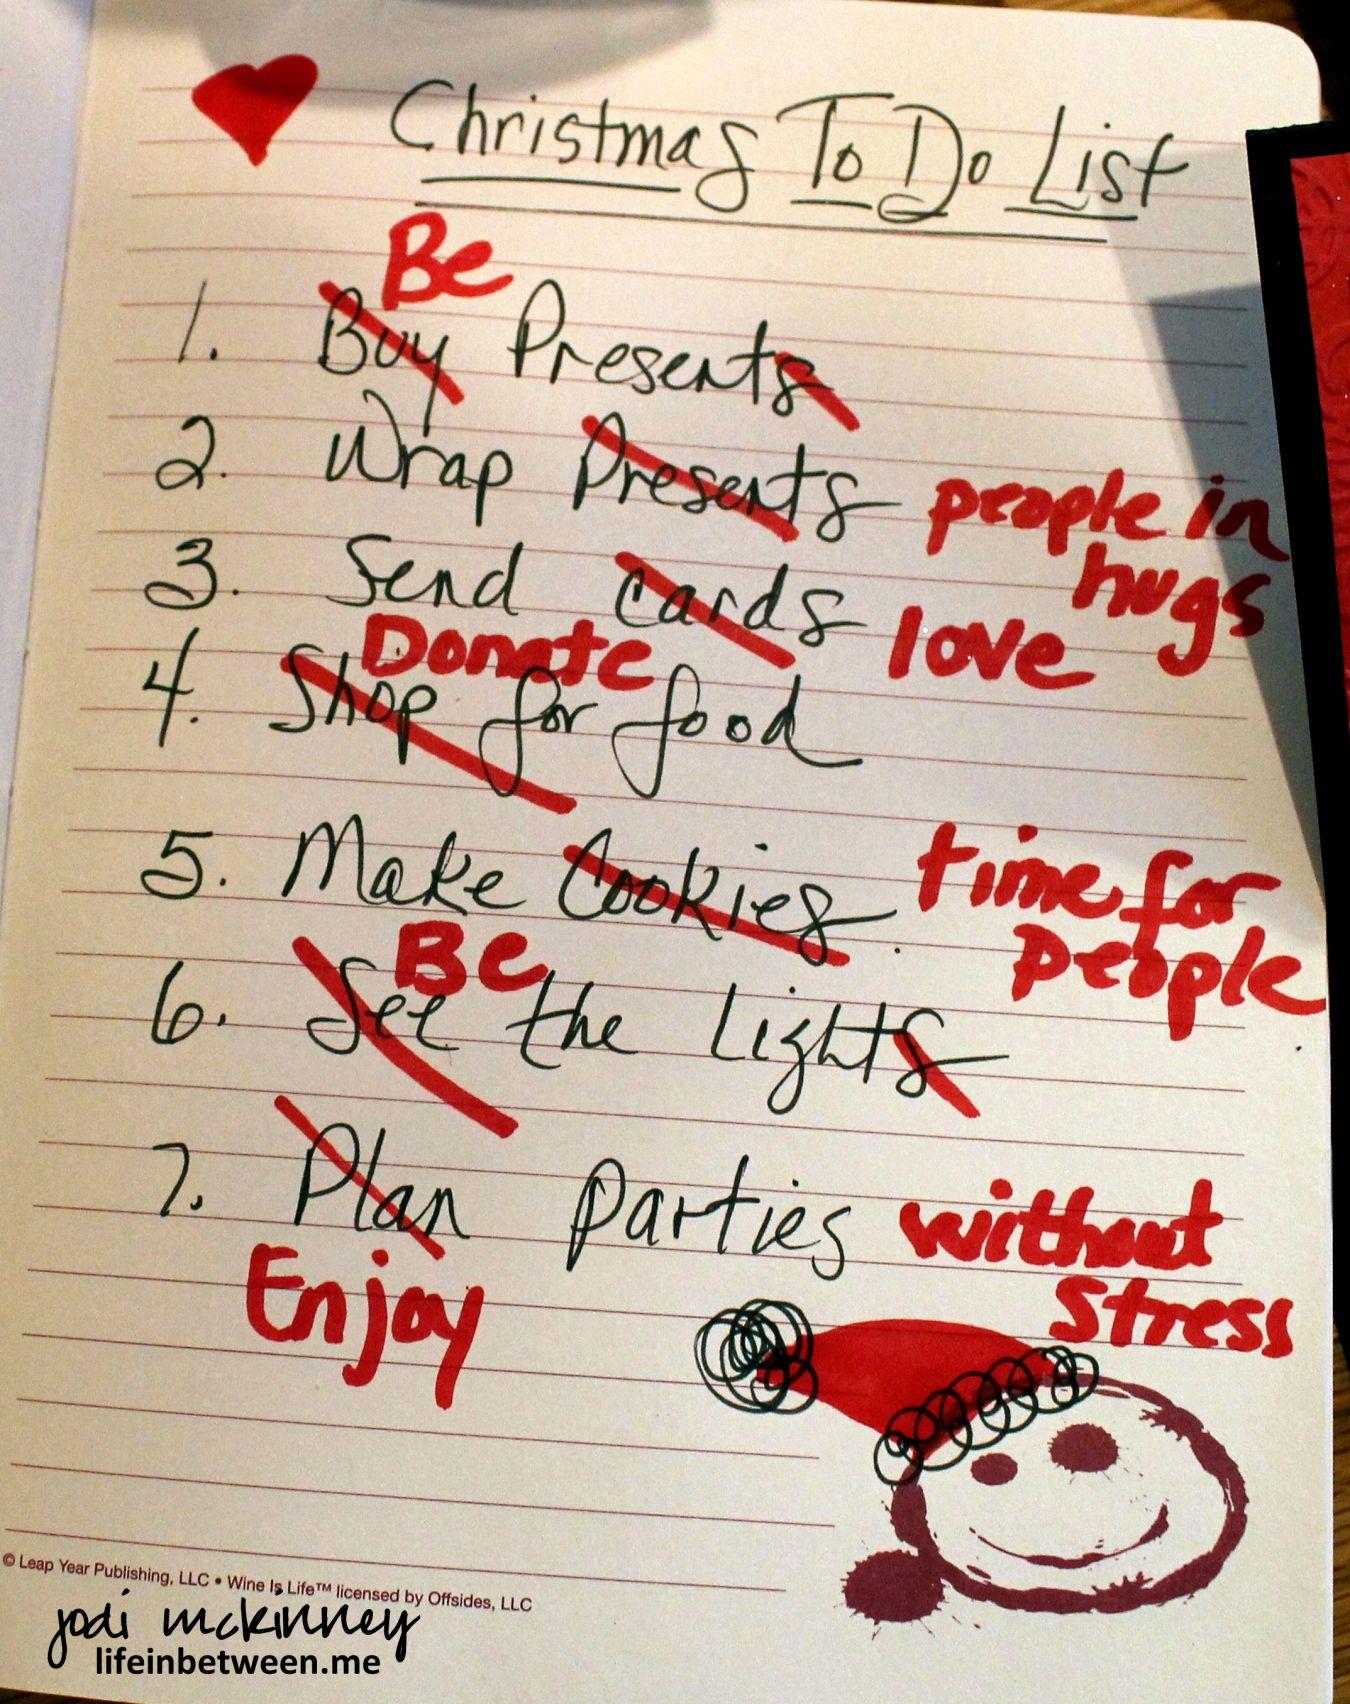 A revised christmas todo list i especially like be